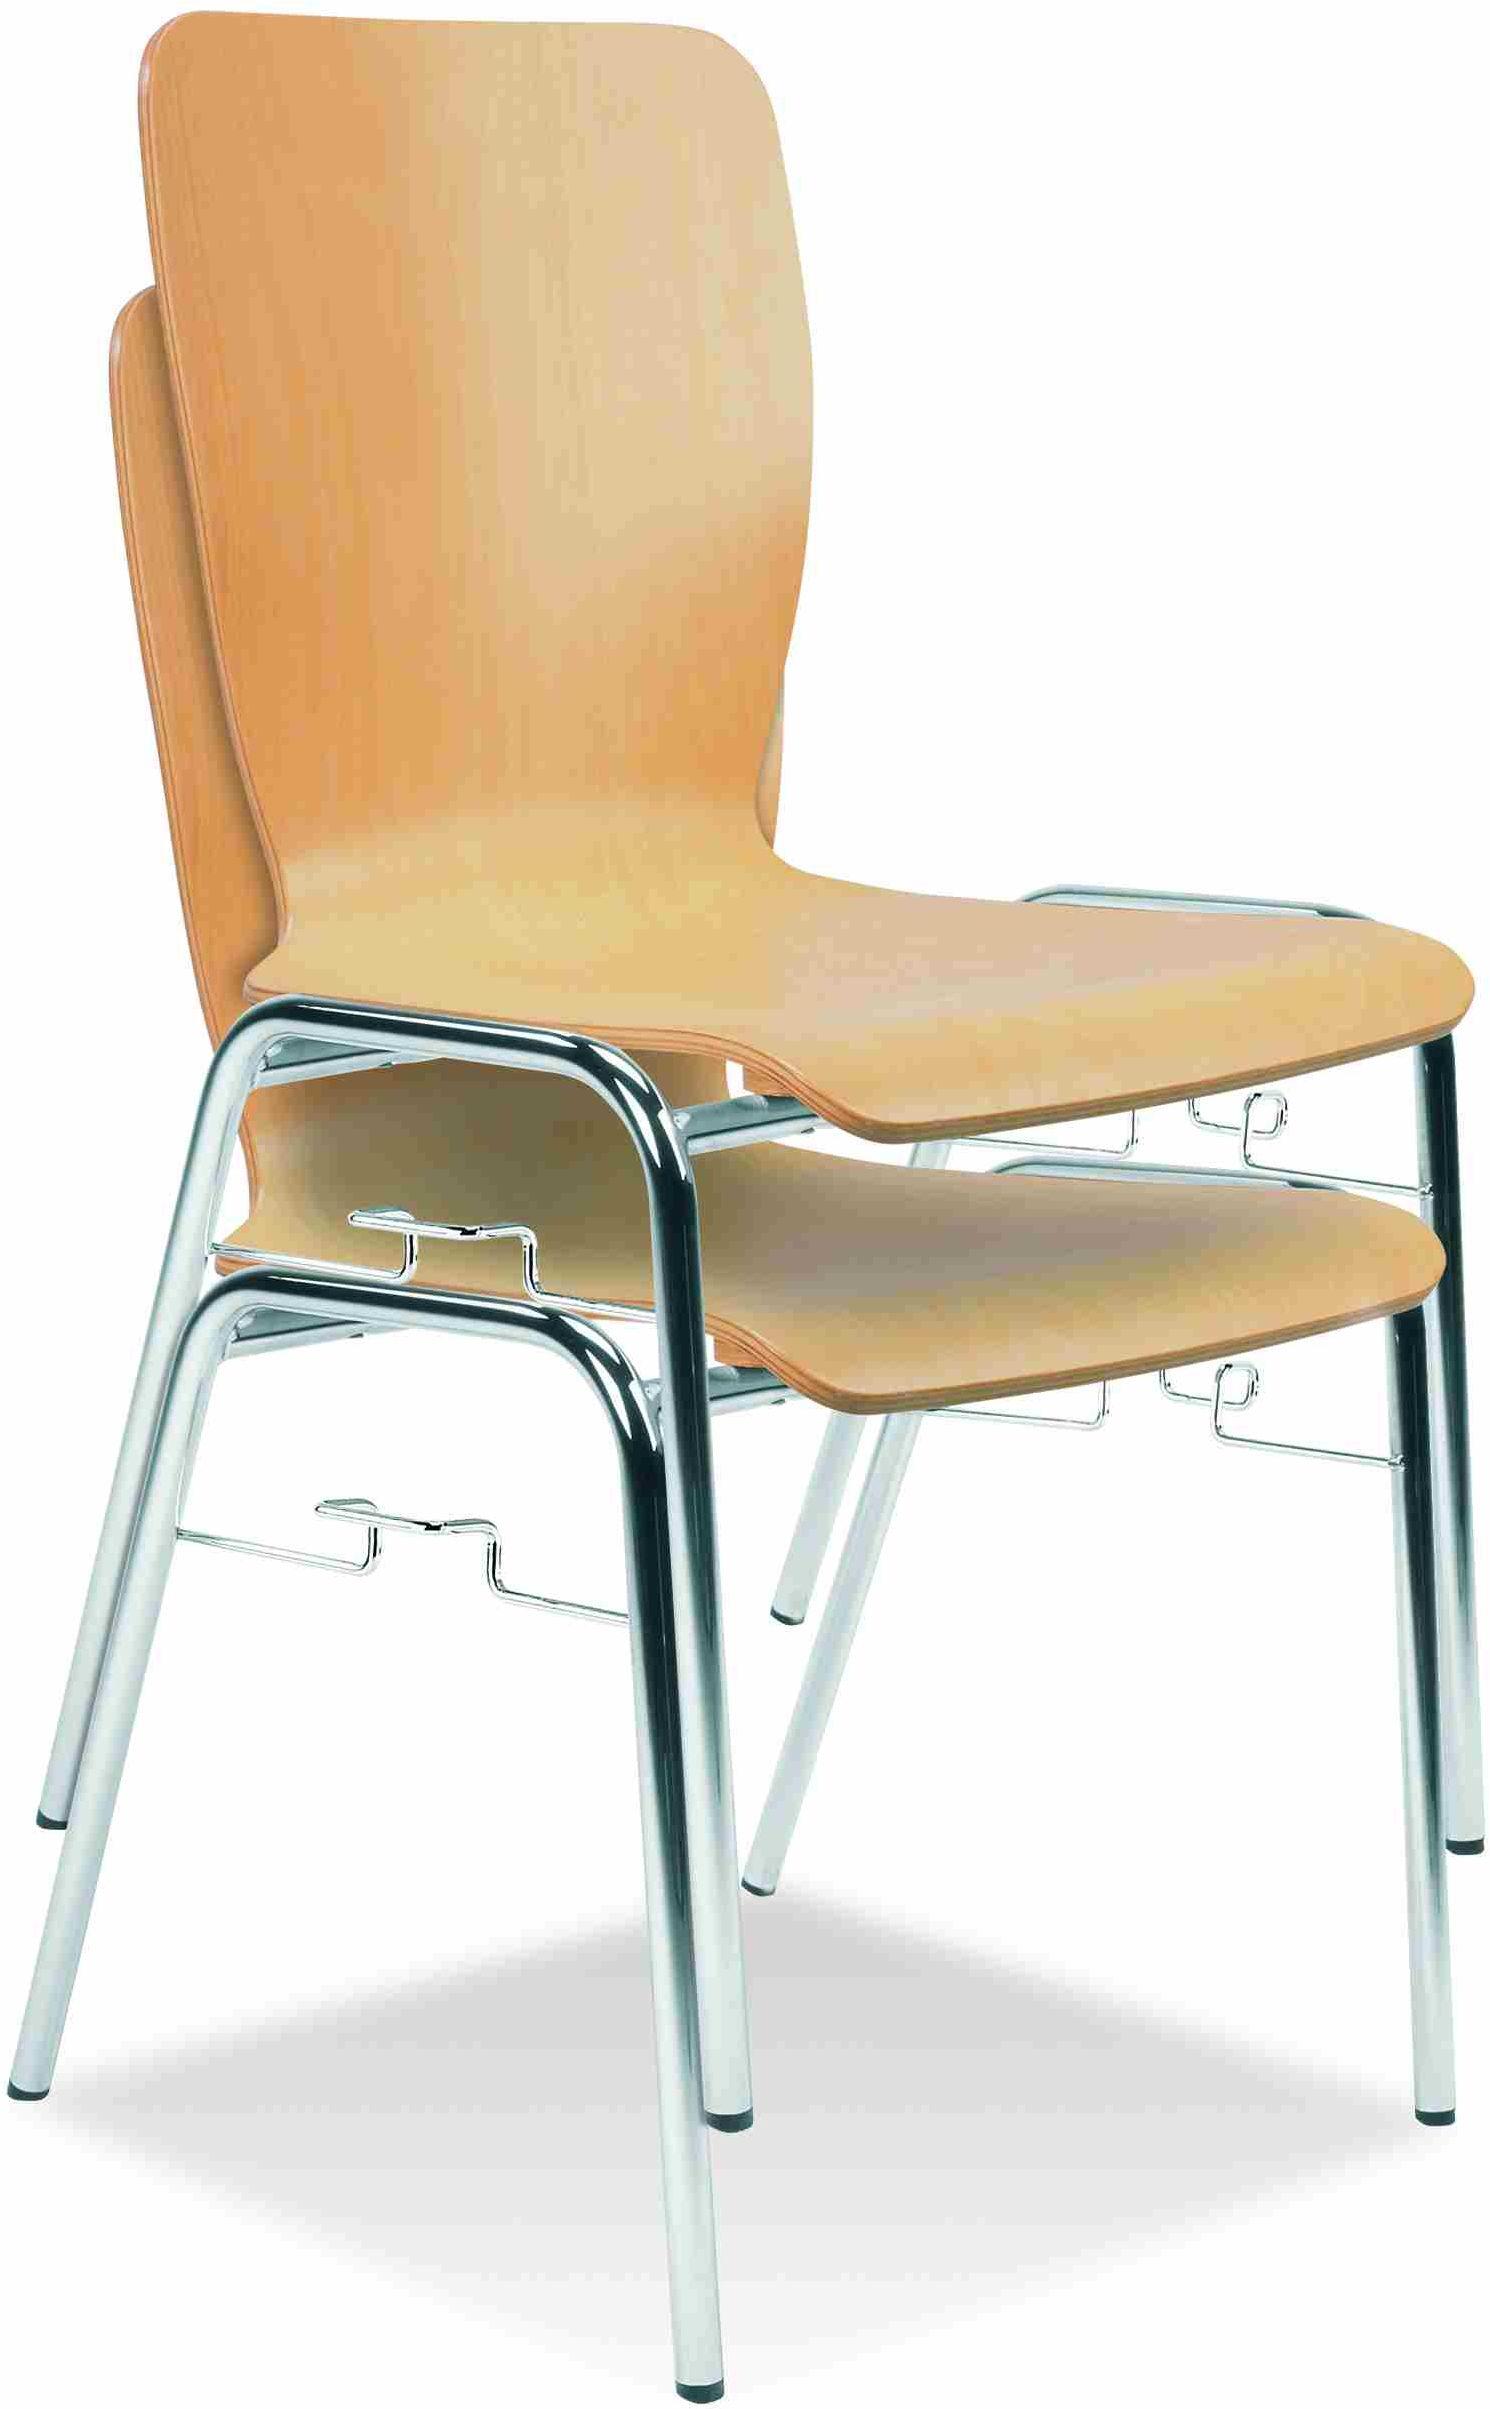 NOWY STYL Krzesło WING II click